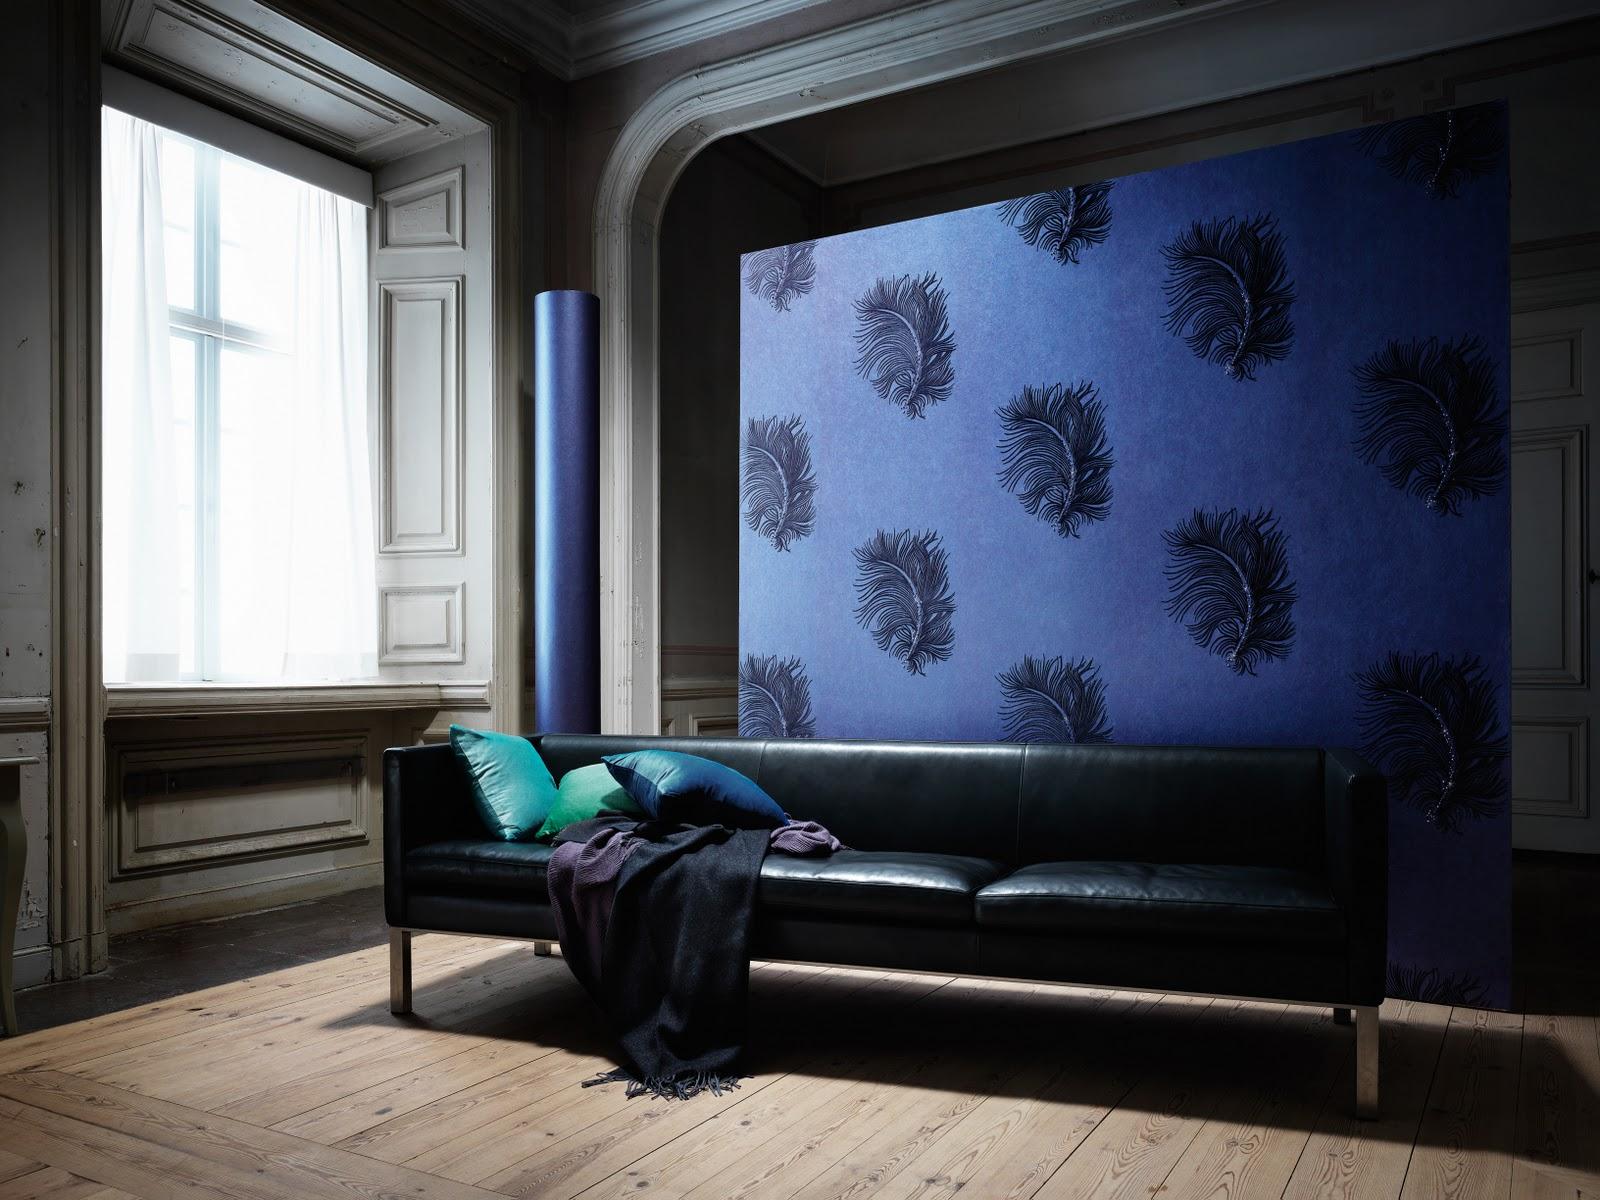 swarovski-elements-wallpaper-collection 6